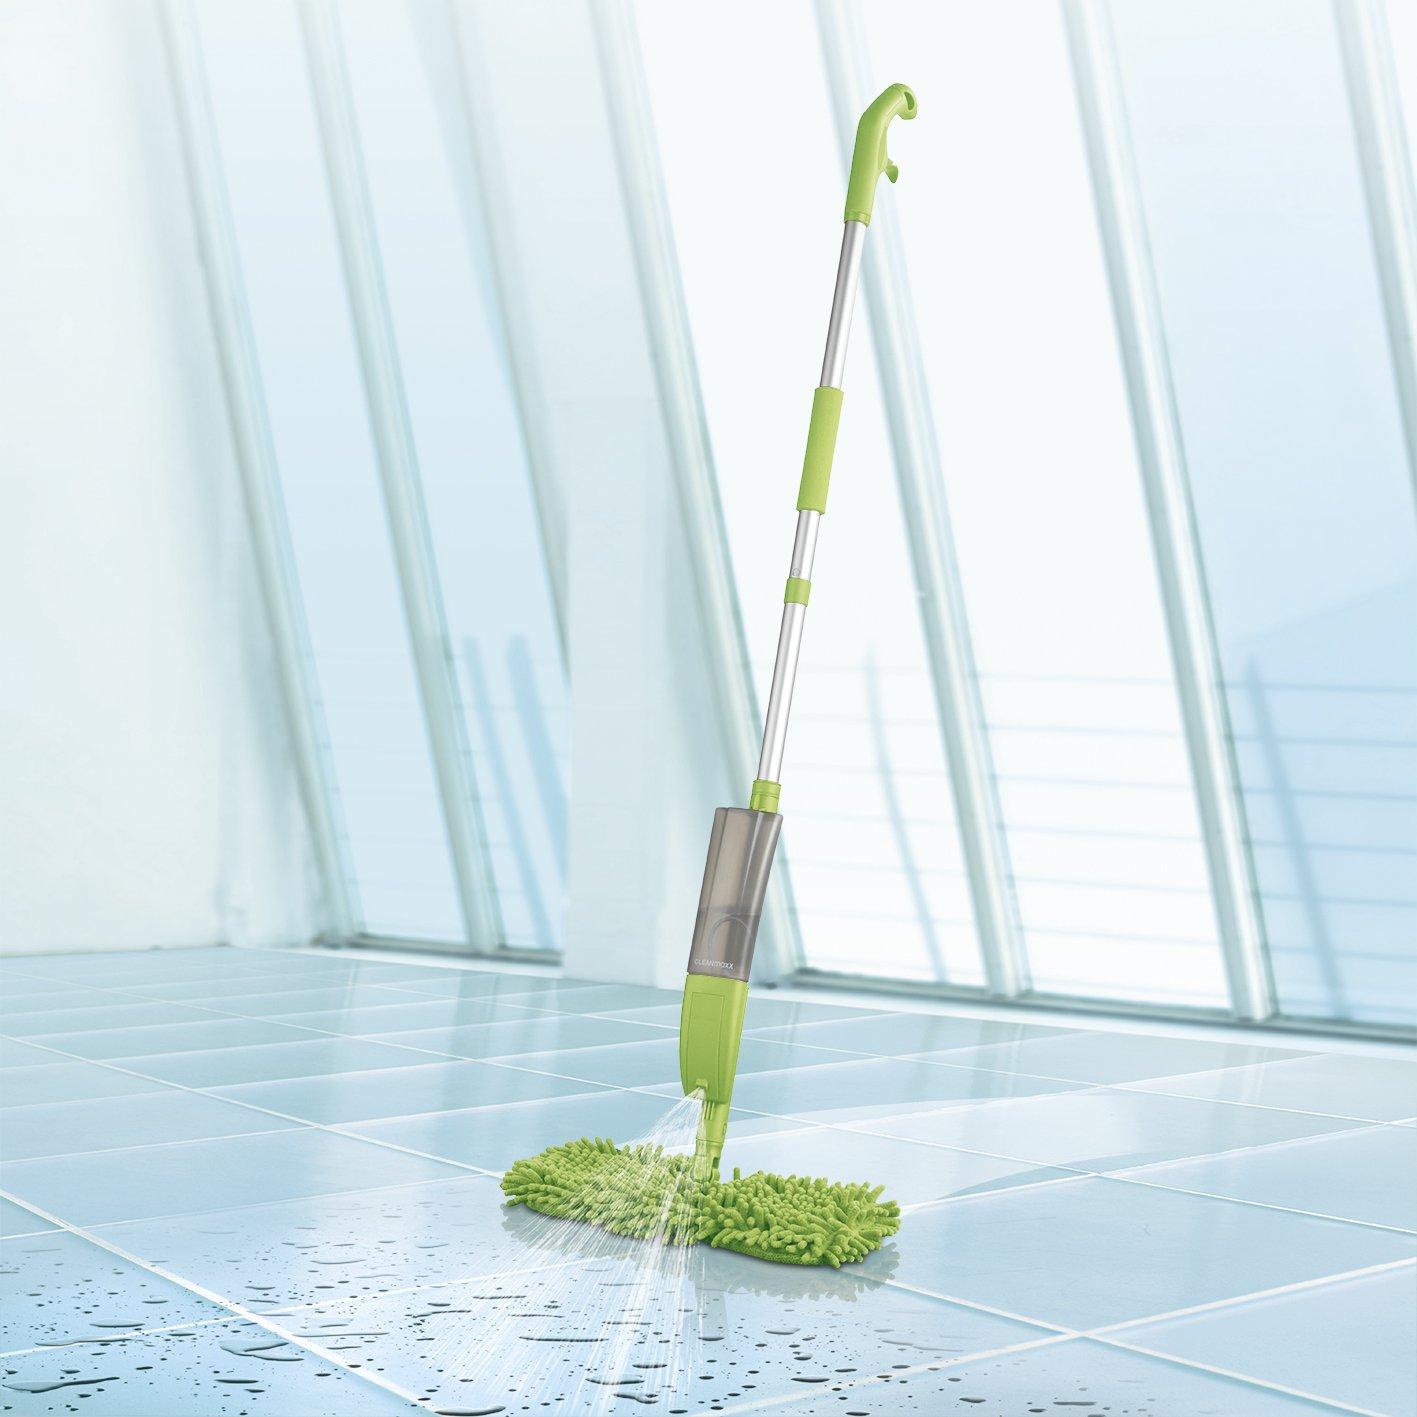 CLEANmaxx 04068 3 in 1 Spray Mop with Flexible Mop Head